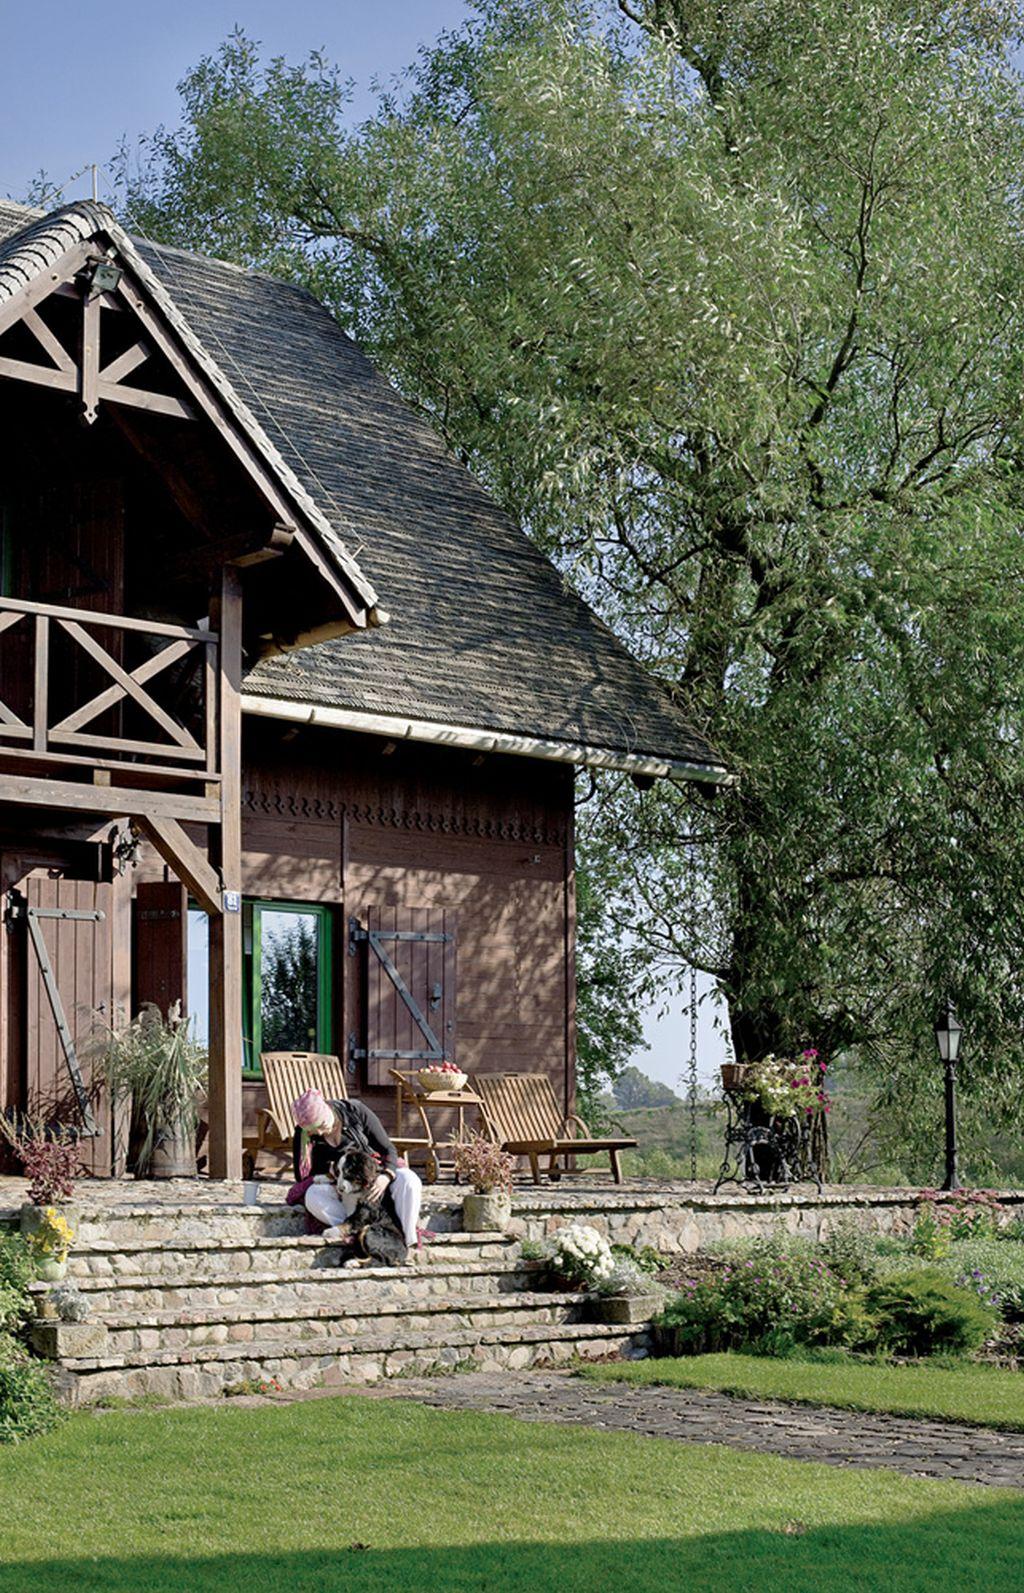 adelaparvu.com despre Koneser House Foto Jan Brykczynski (6)